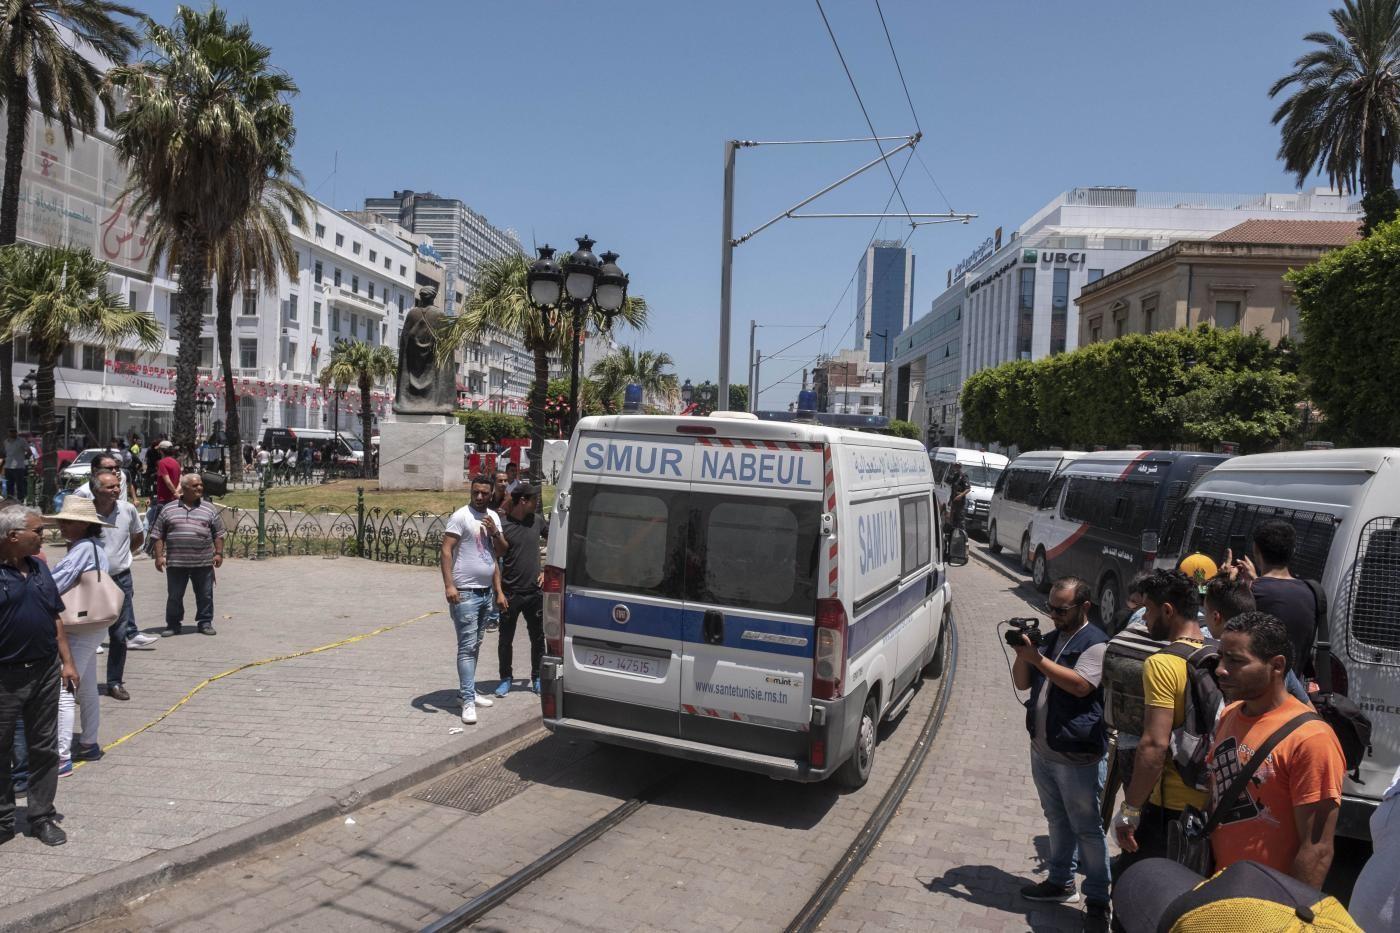 Tunisi, kamikaze si fa esplodere davanti ad ambasciata Usa: feriti